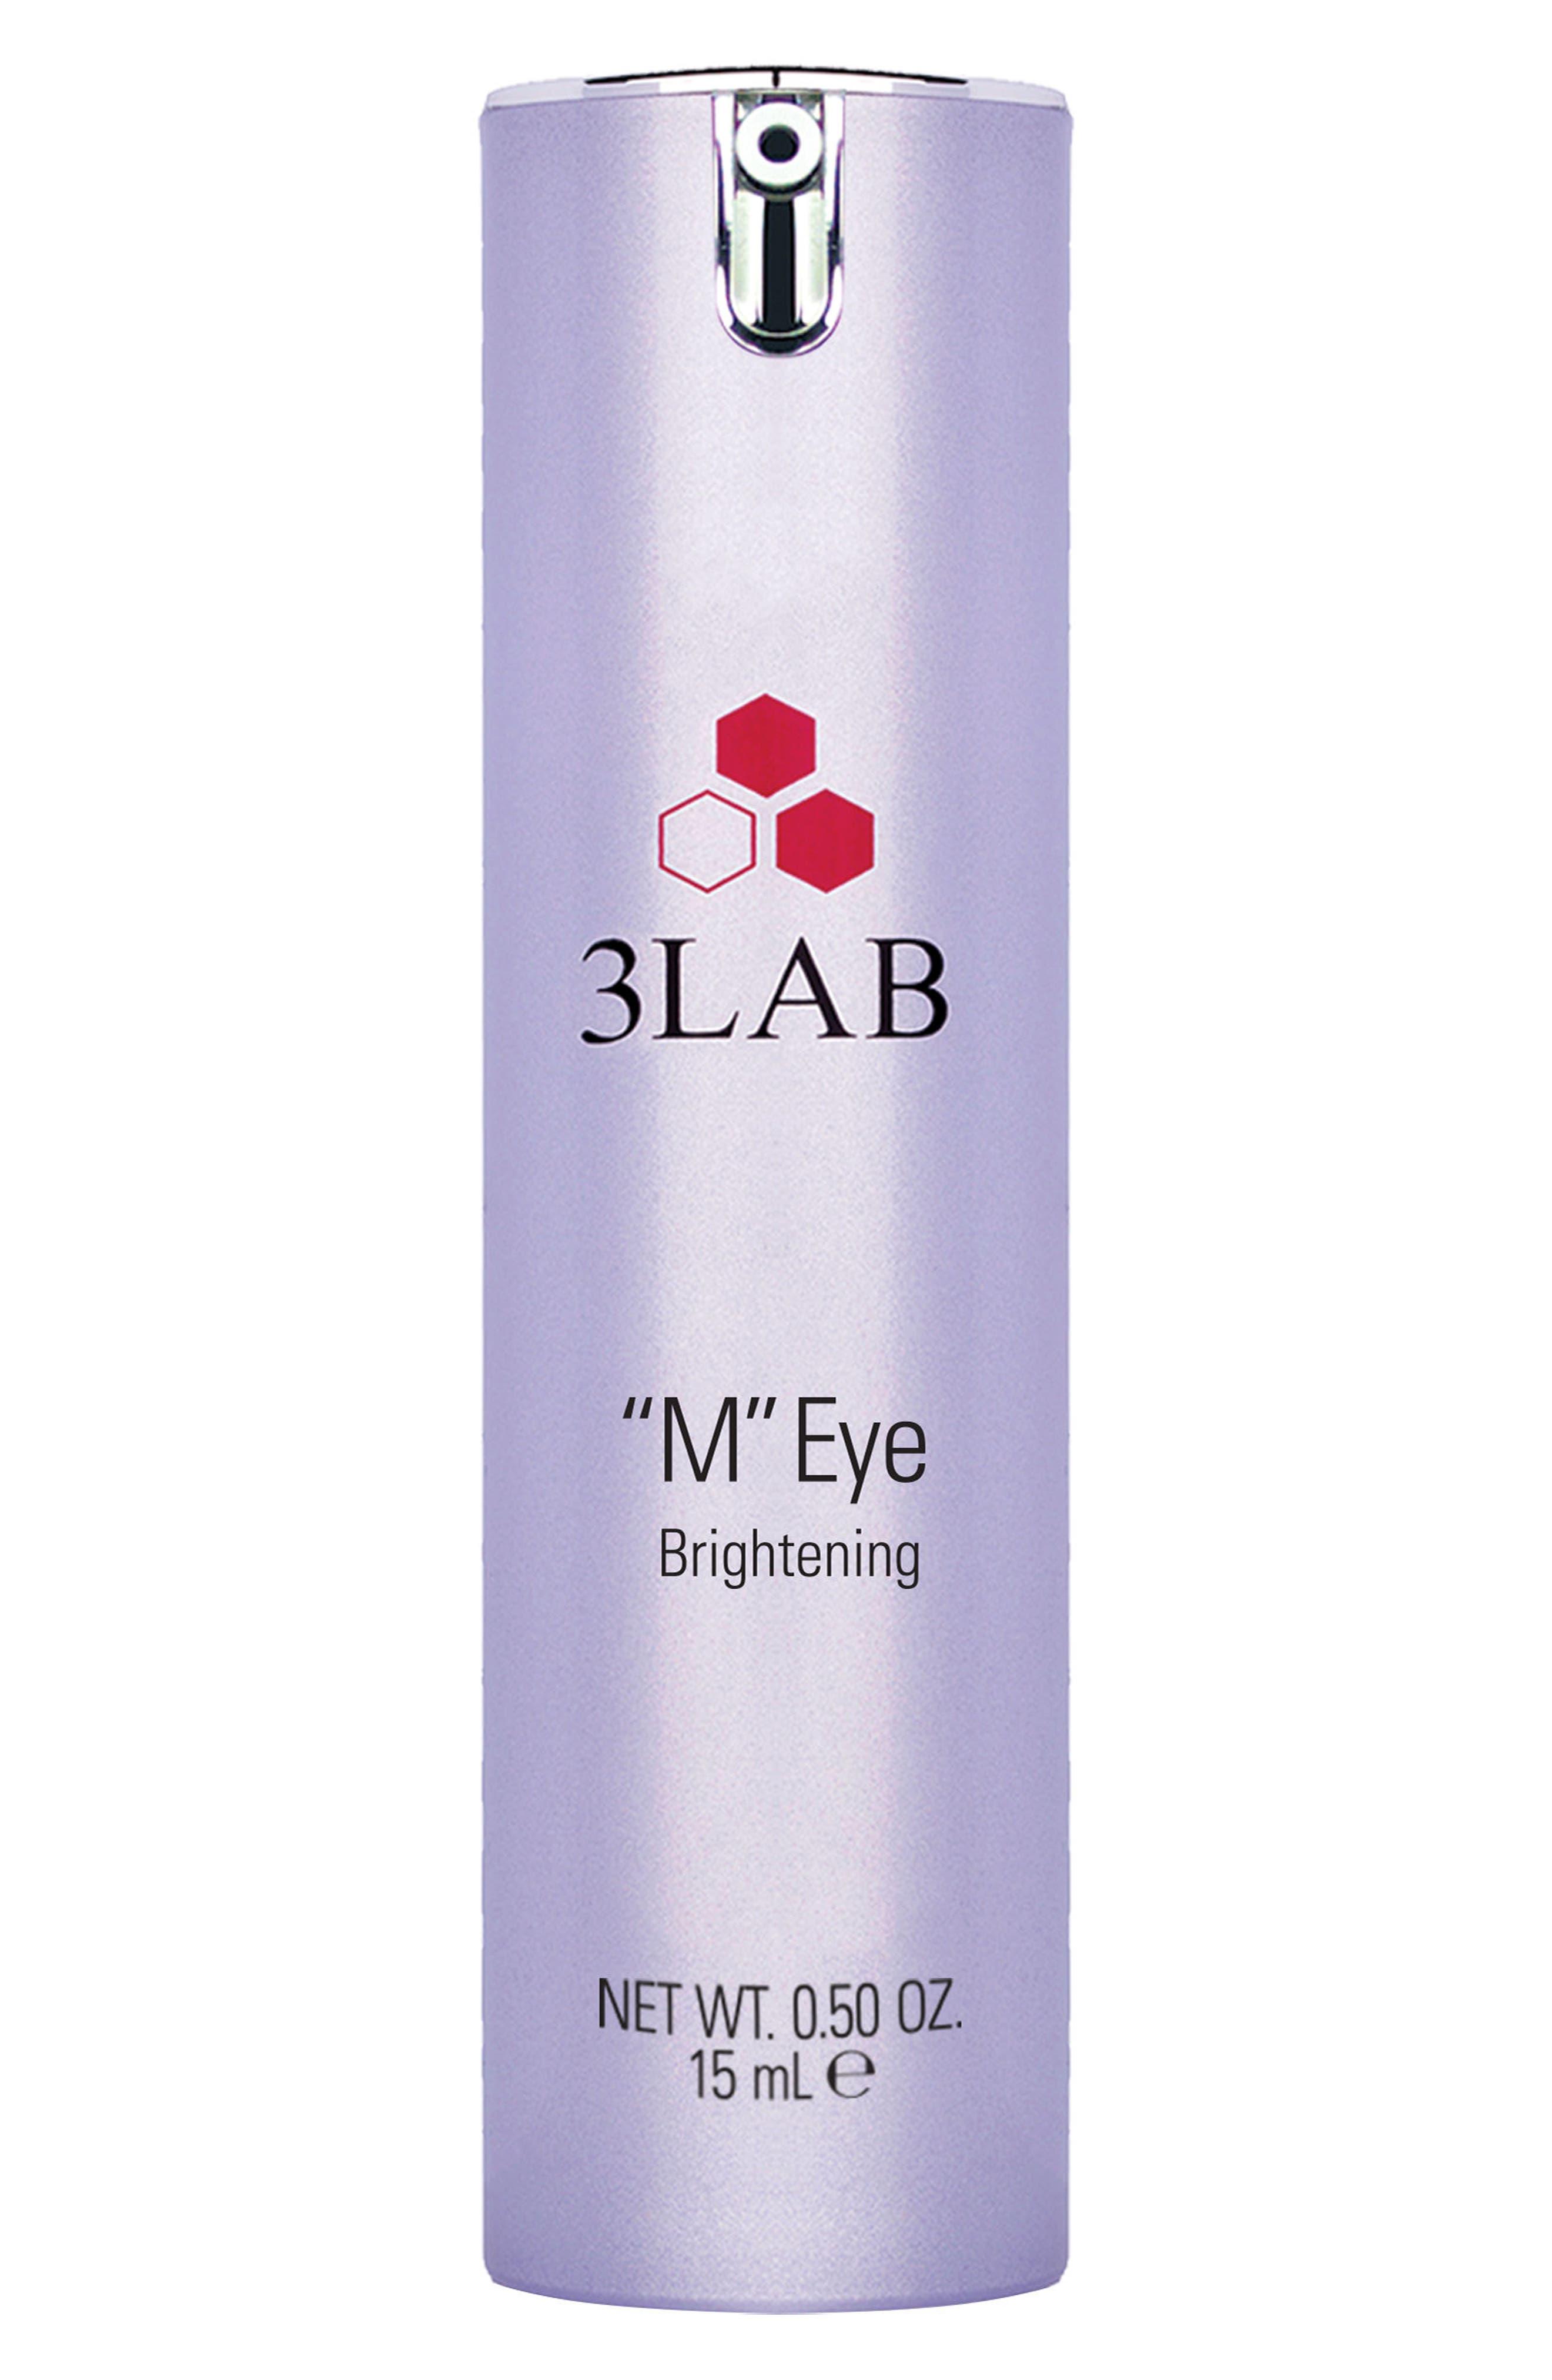 3LAB M Eye Brightening Eye Cream